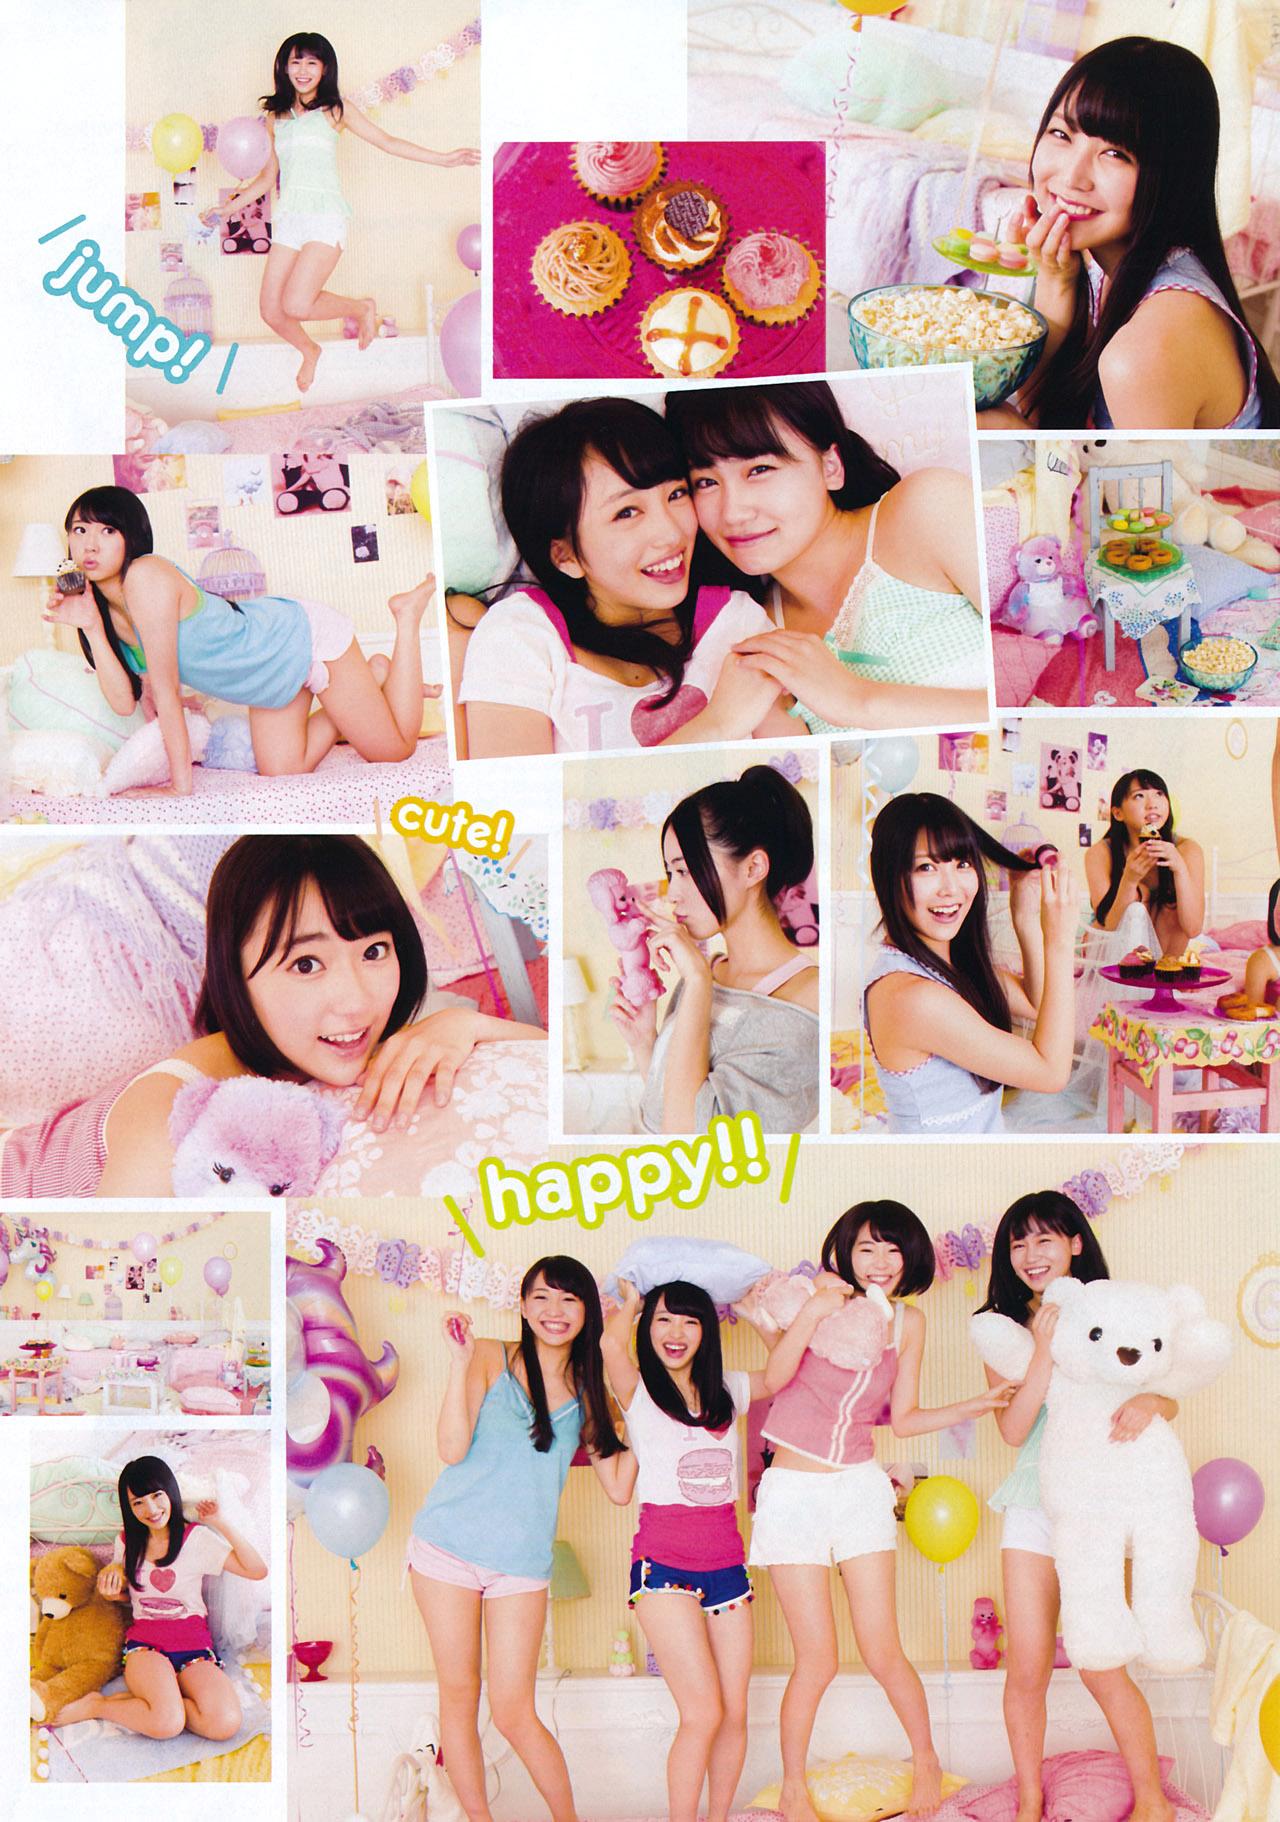 AKB48 WPB 141210 10.jpg